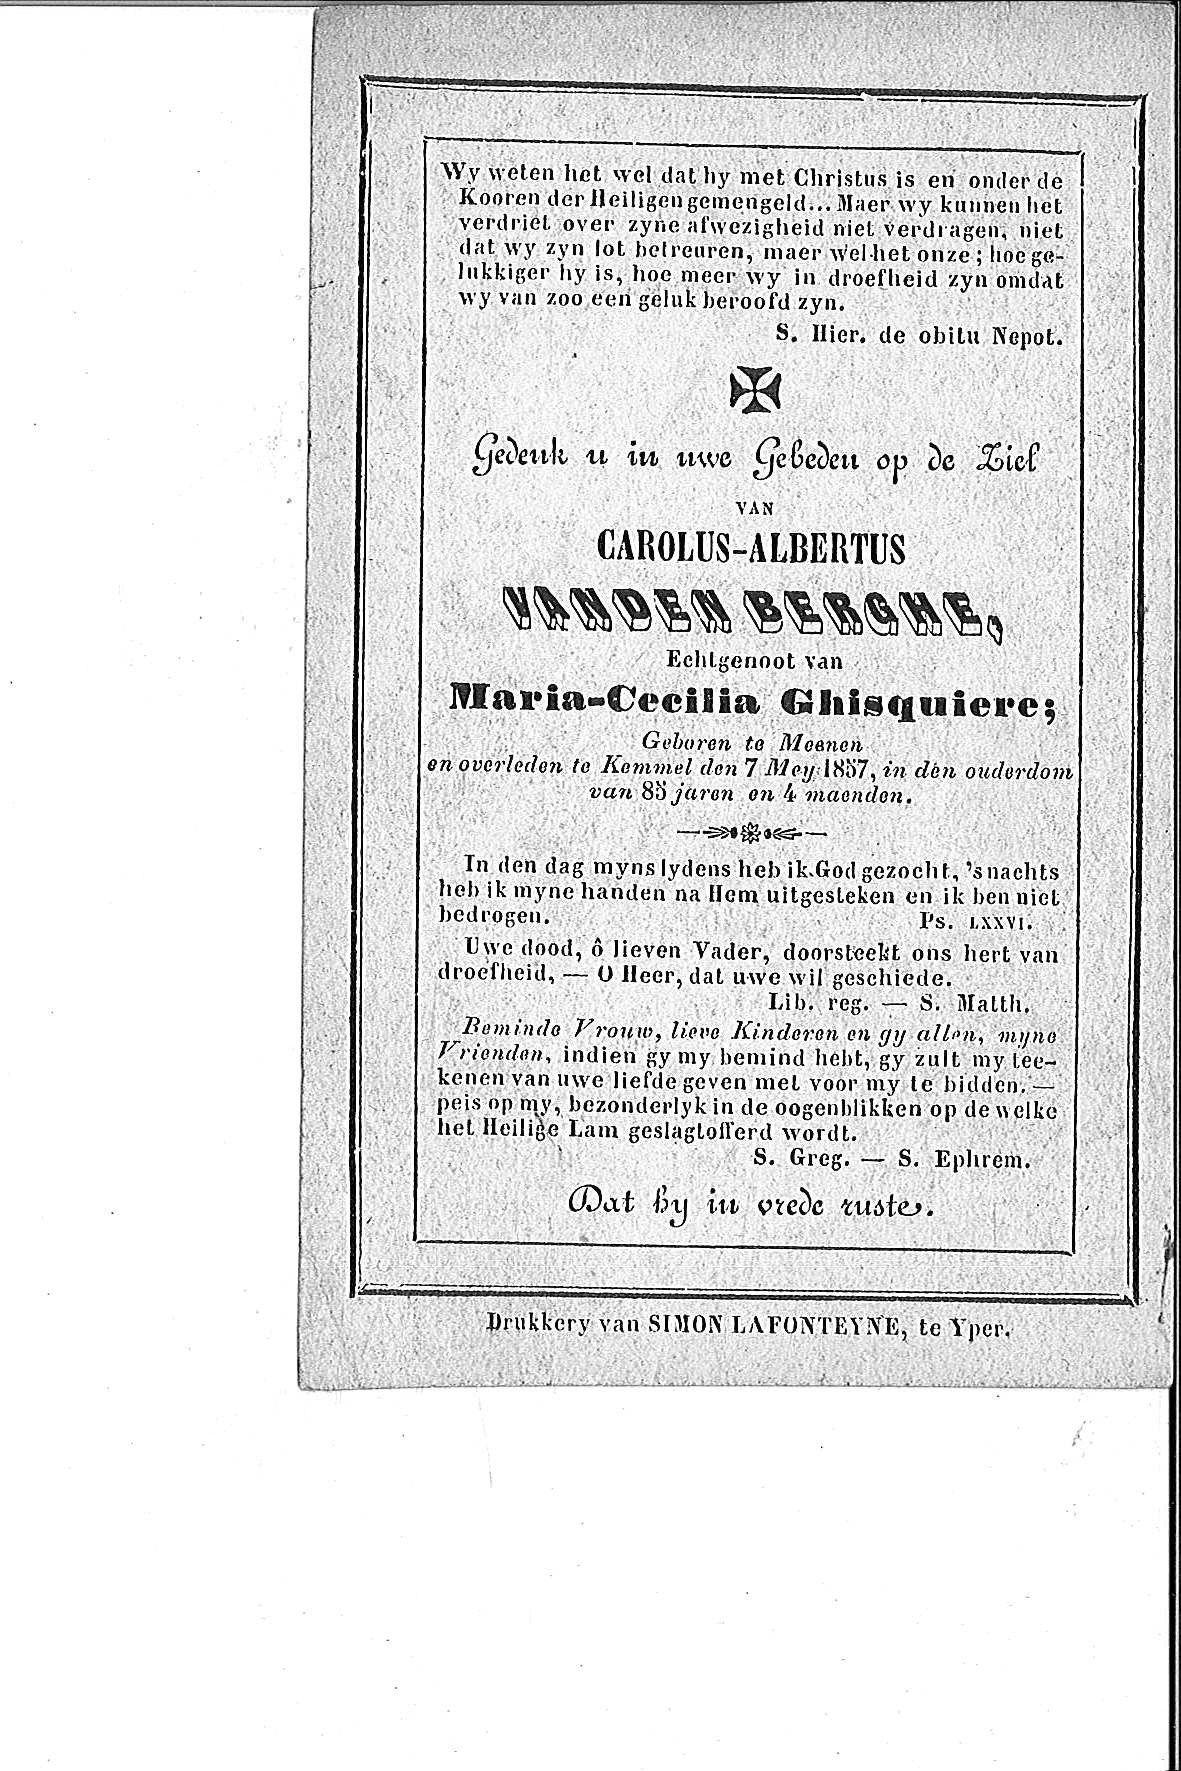 Carolus_Albertus(1857)20150807111619_00057.jpg